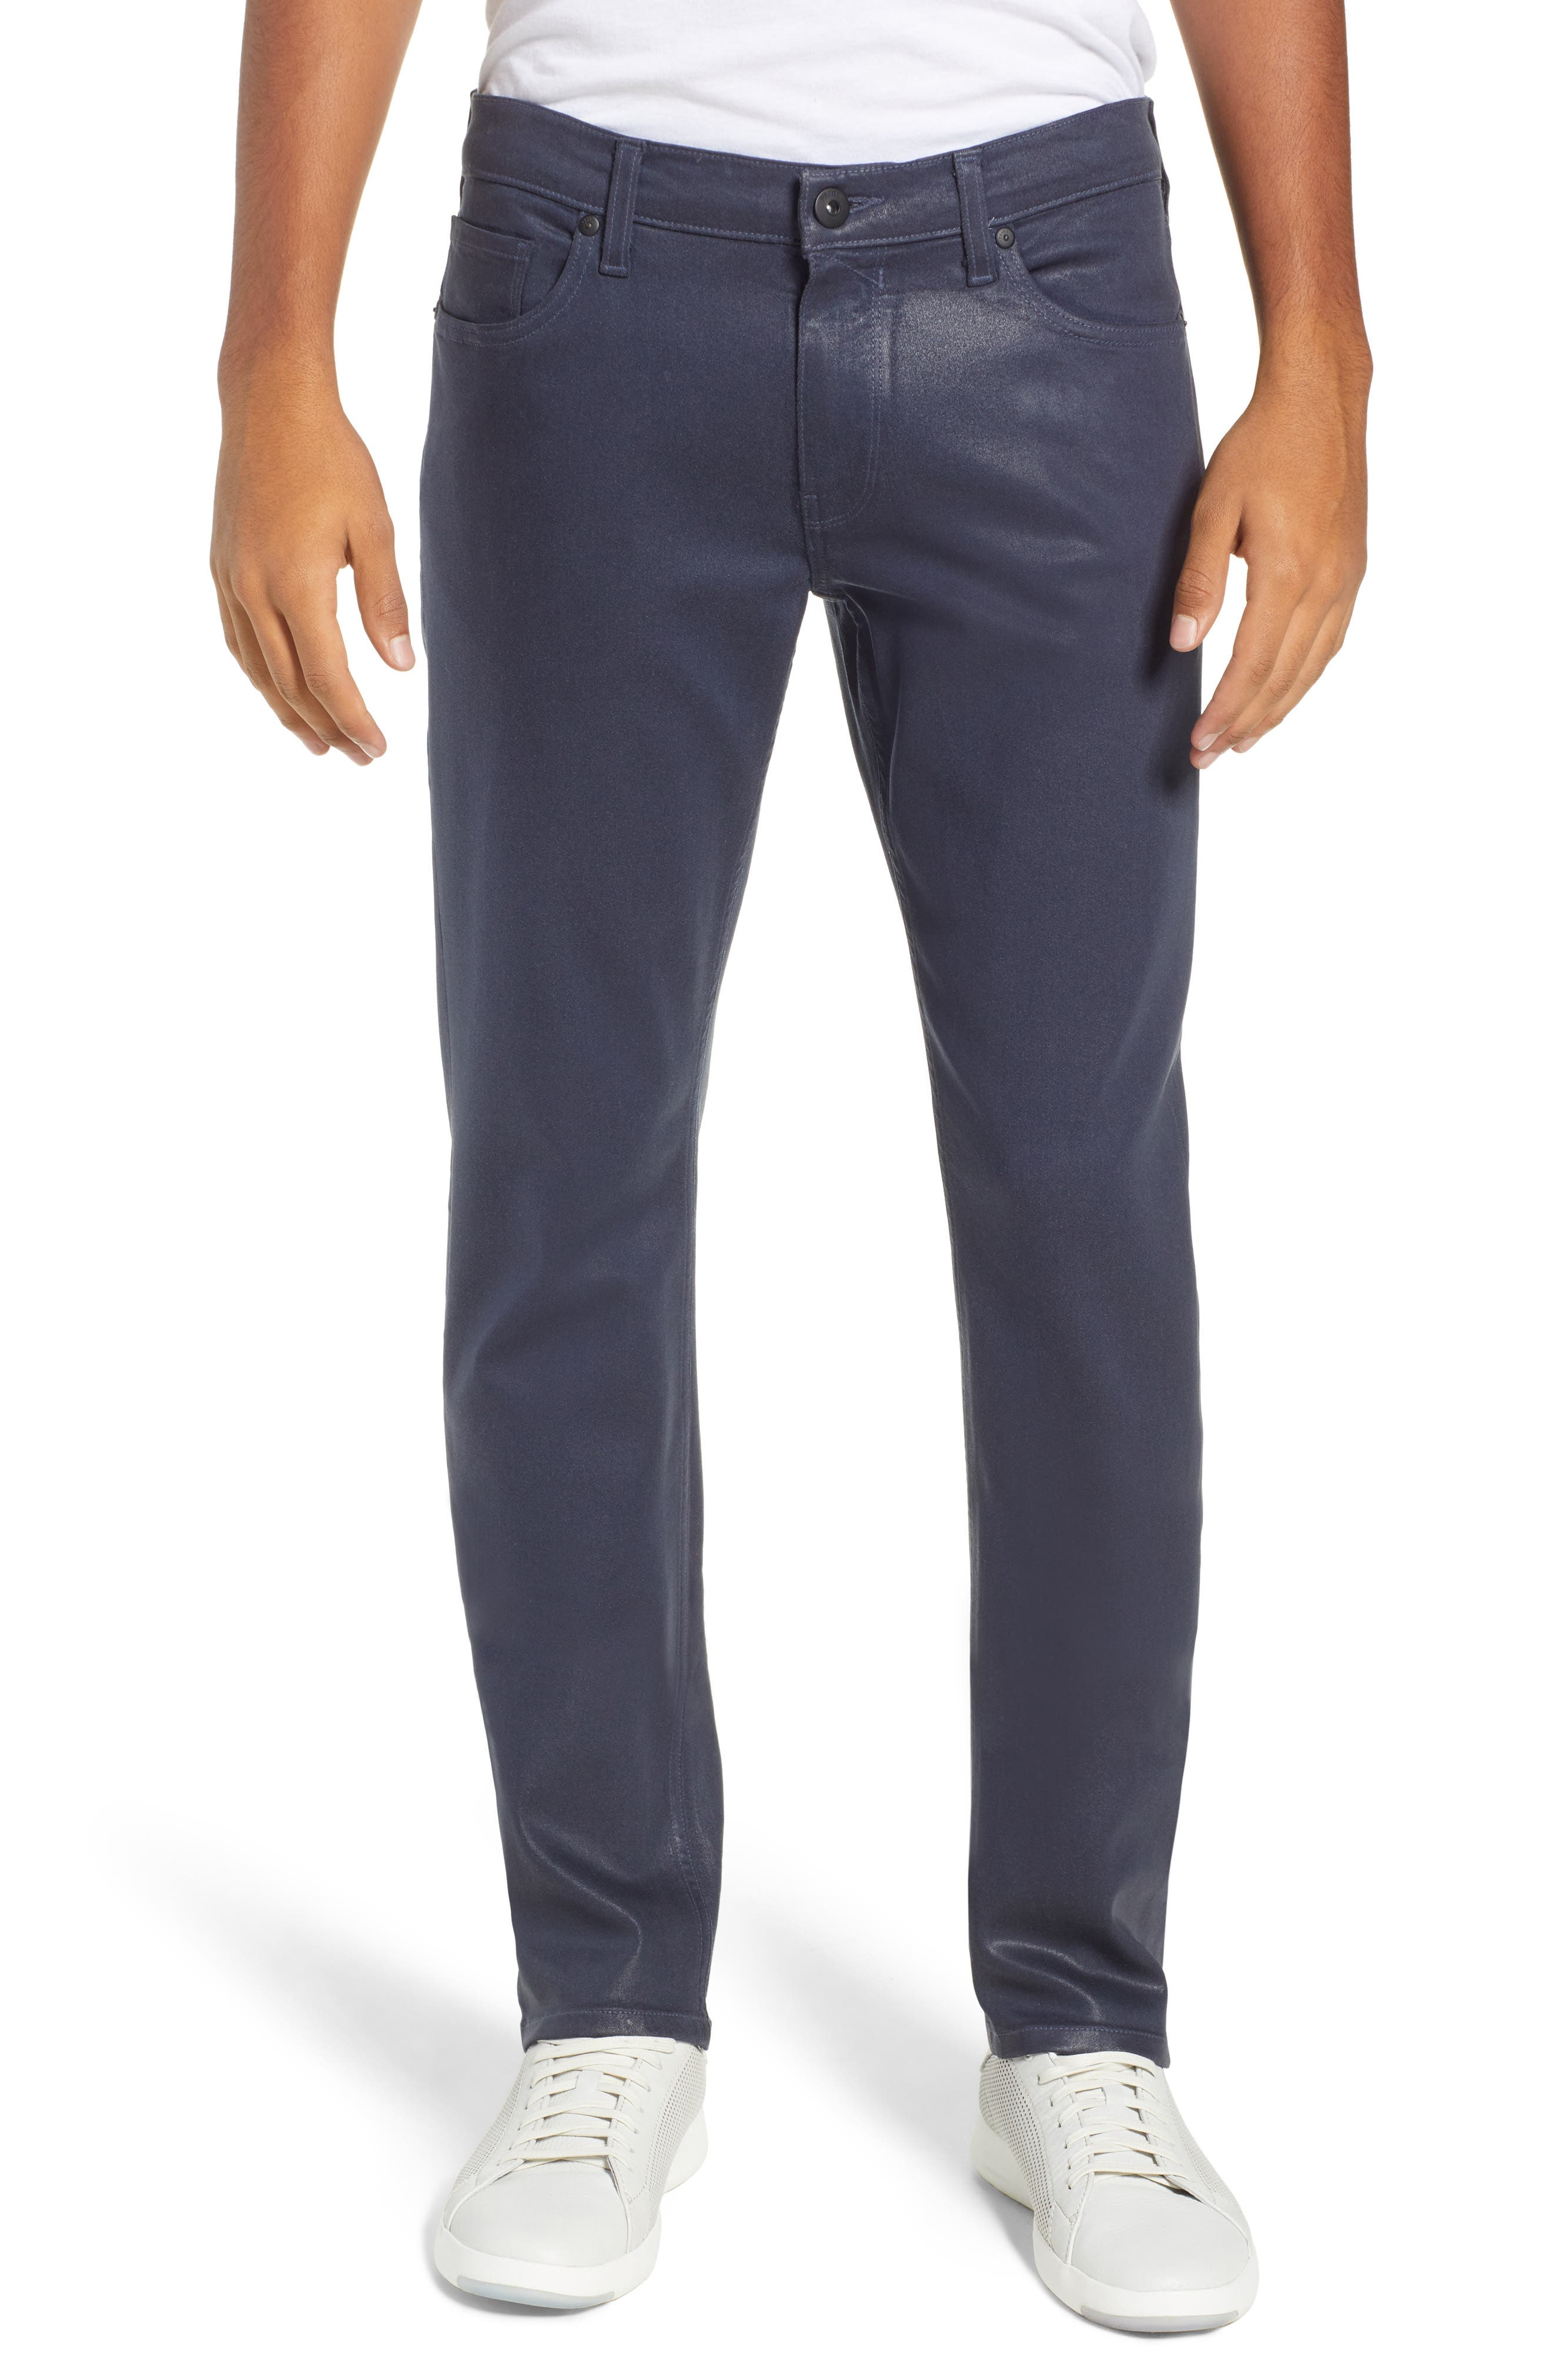 Transcend - Lennox Slim Fit Jeans,                         Main,                         color, NIGHTFALL COATED